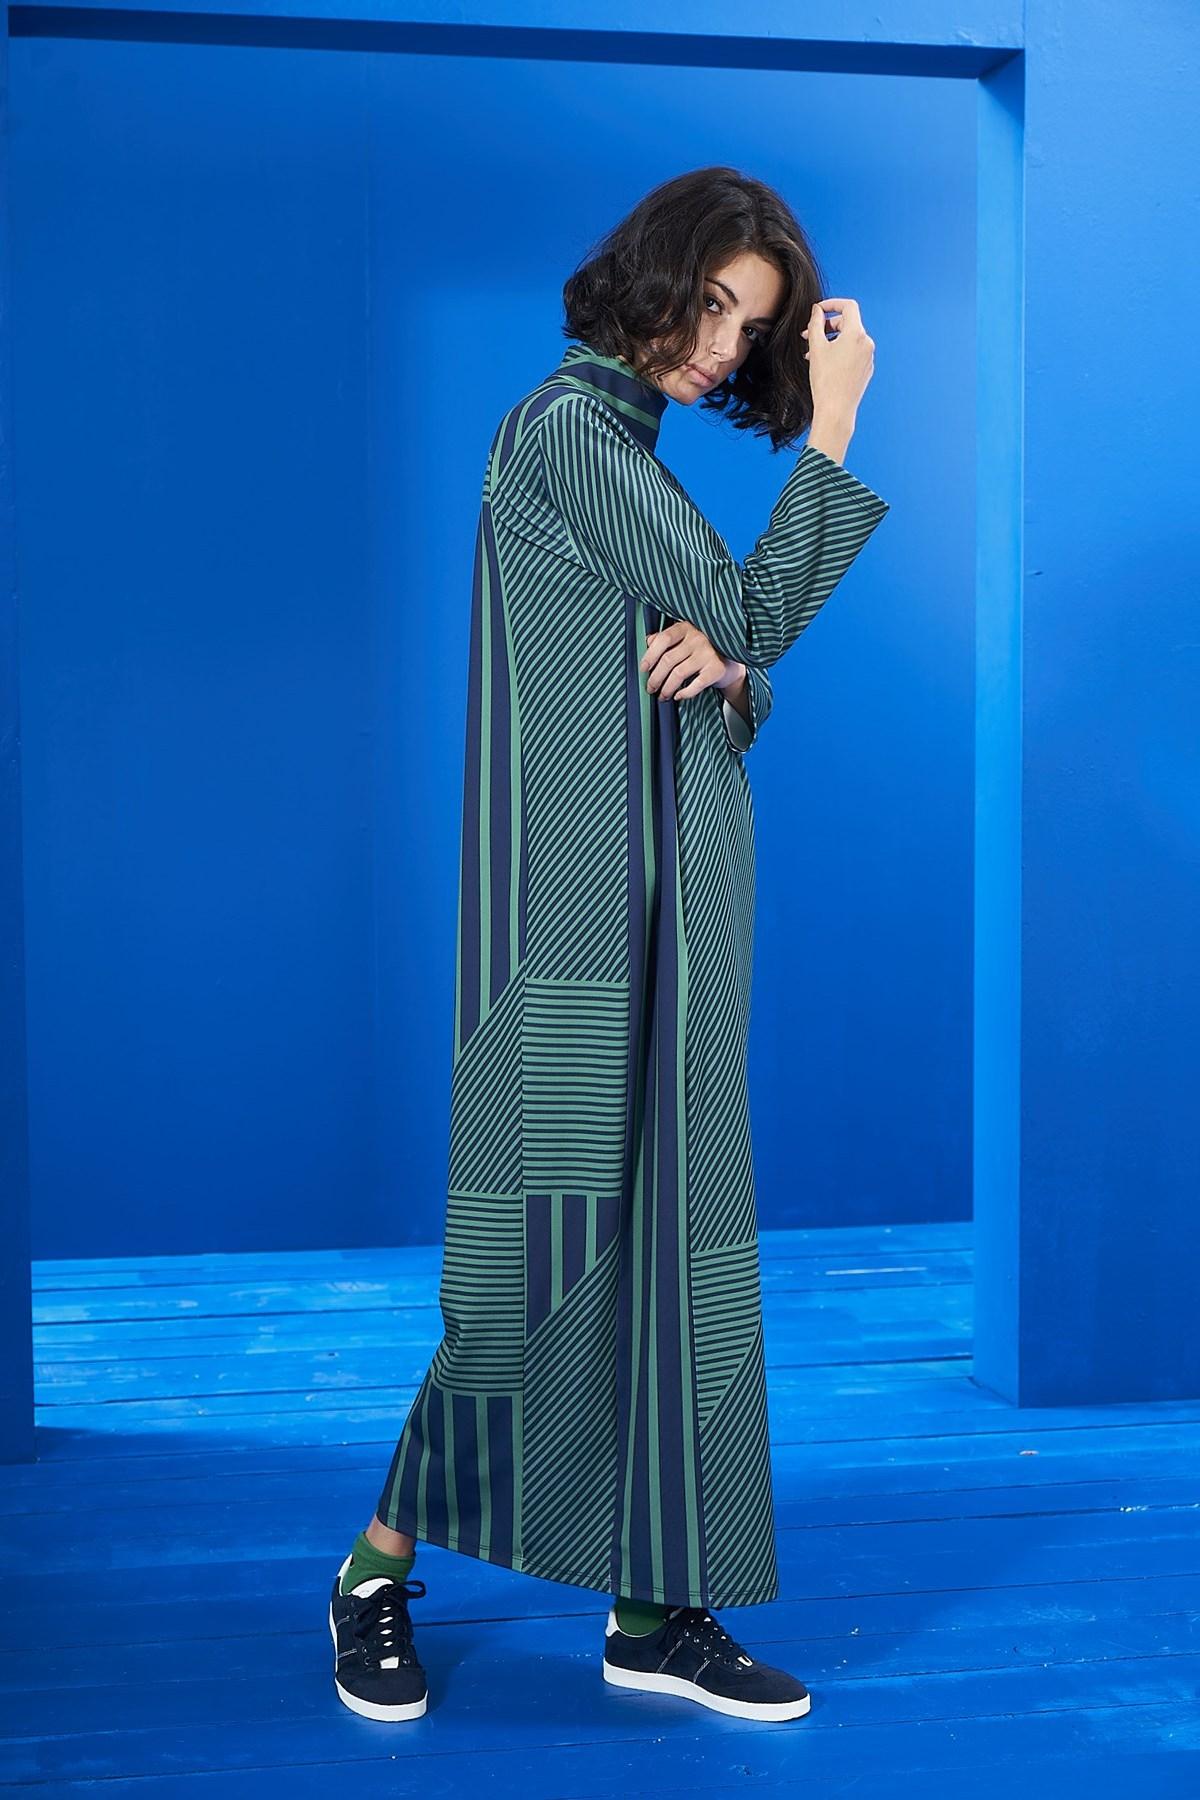 Mevra - Lacivert-Yeşil Çizgili Elbise